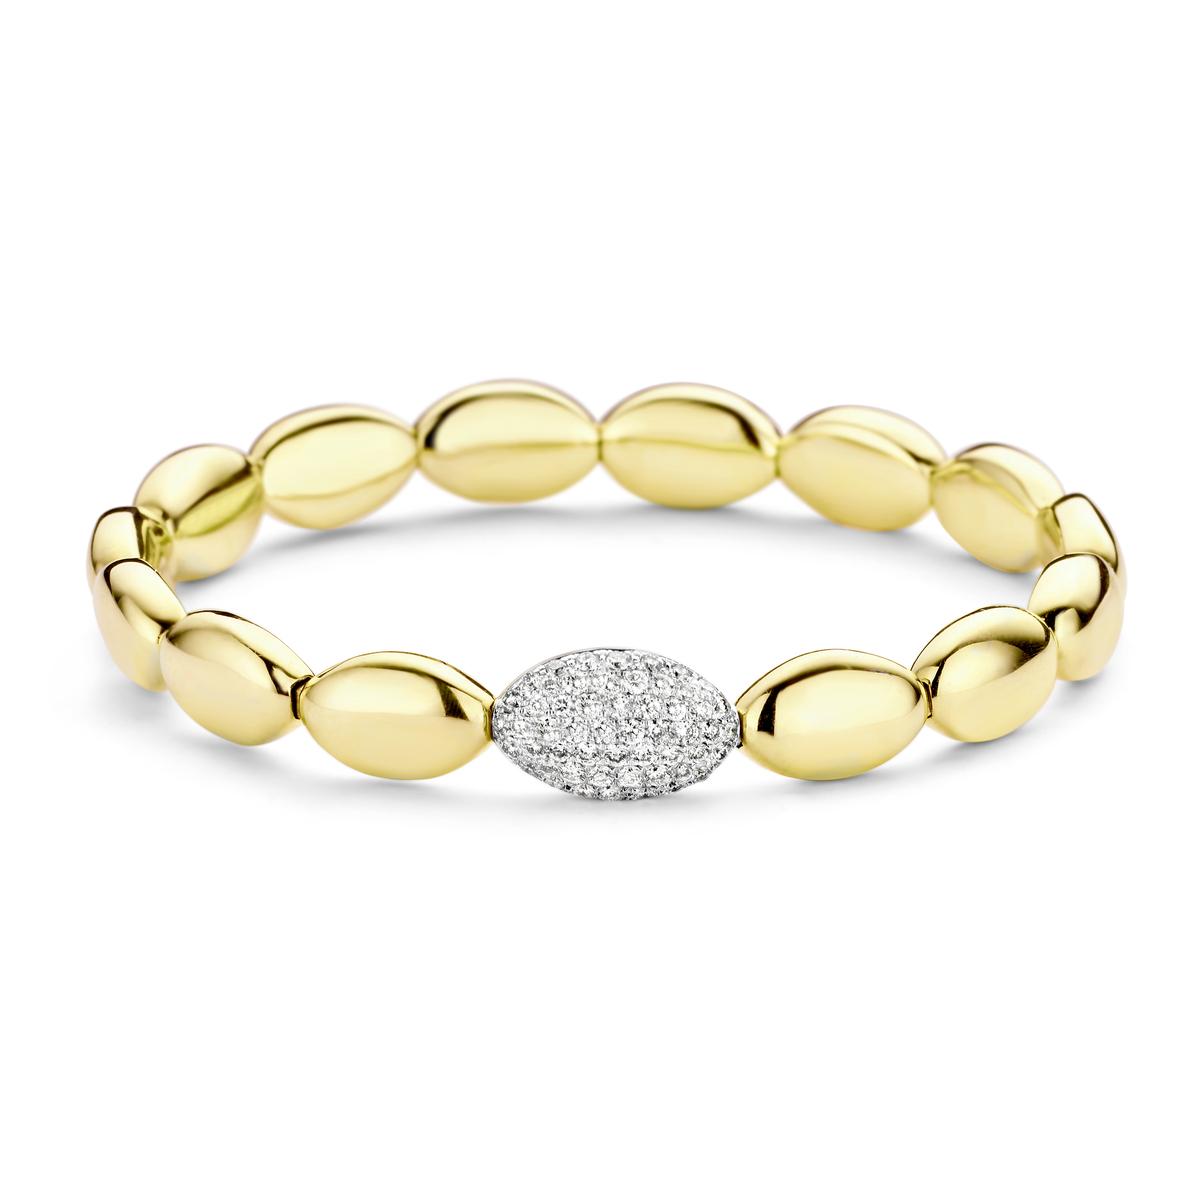 vulsini bracelet in yellow gold